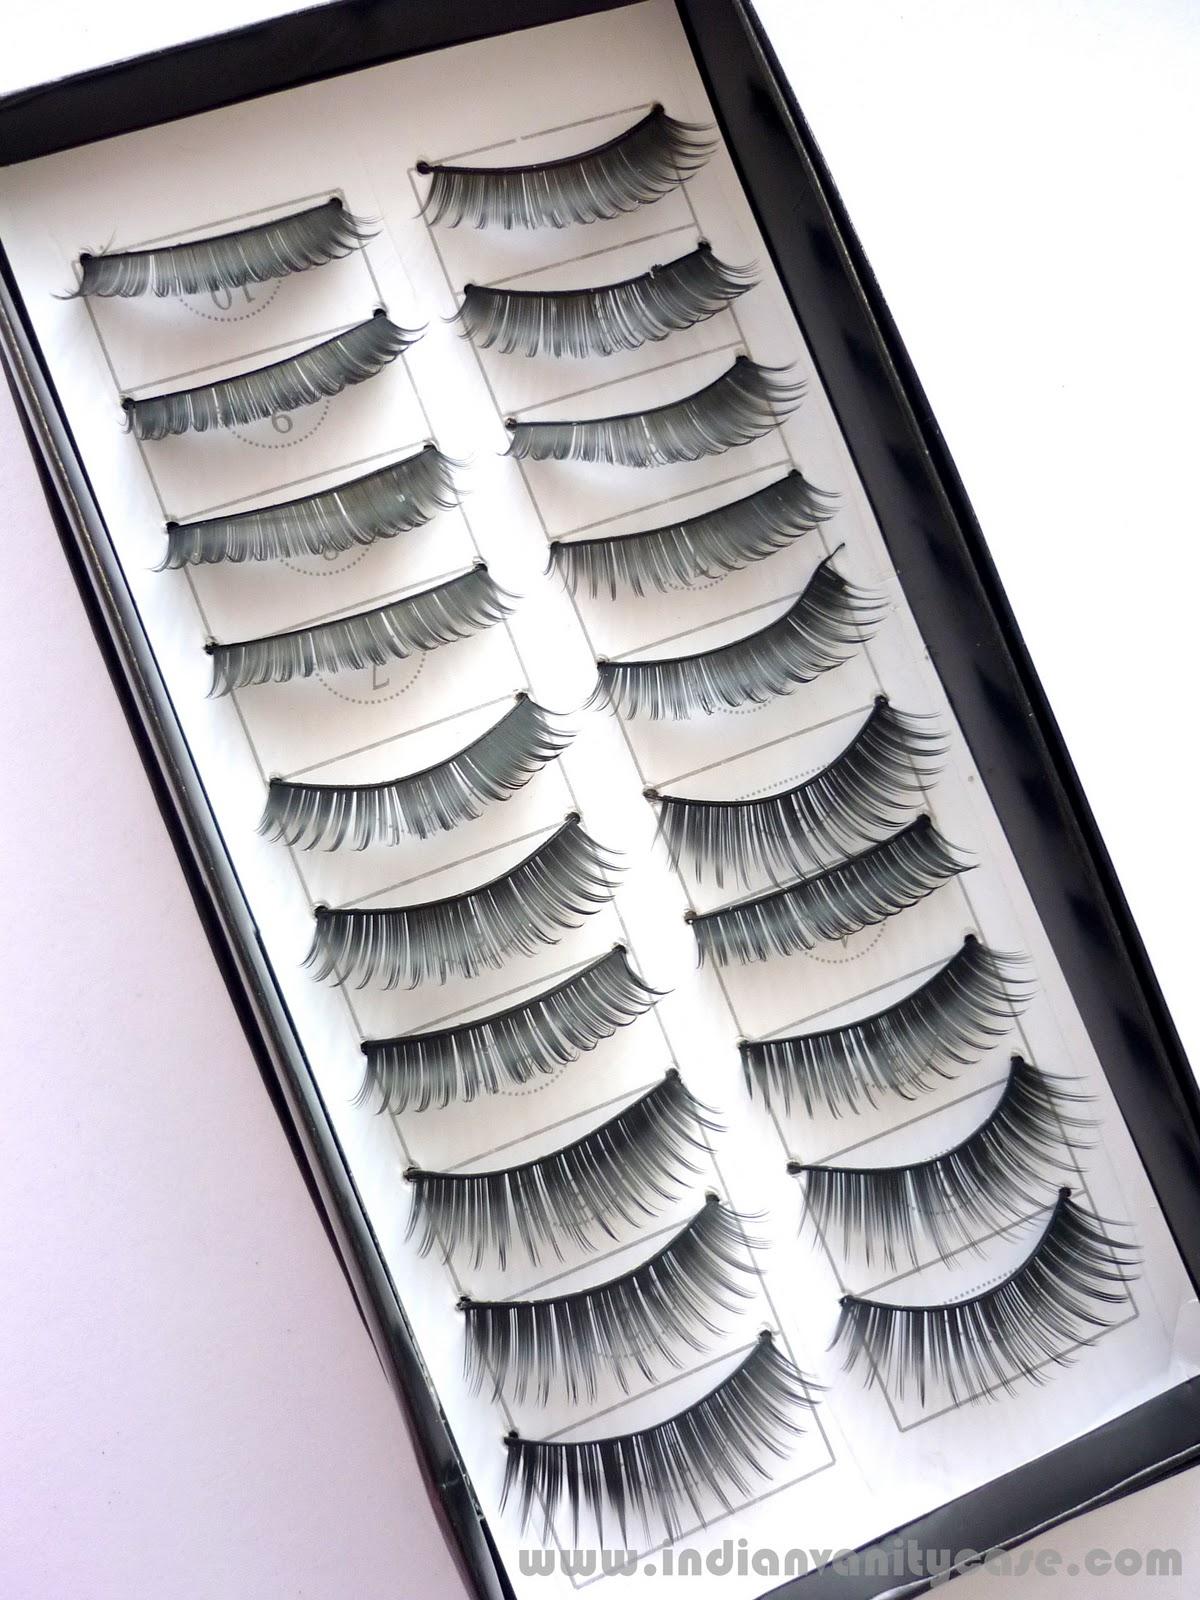 http://4.bp.blogspot.com/_K-Xz3c9hTQc/TScAsSwJf0I/AAAAAAAAEJA/A-ijvikDYAw/s1600/es+eyelashes.jpg